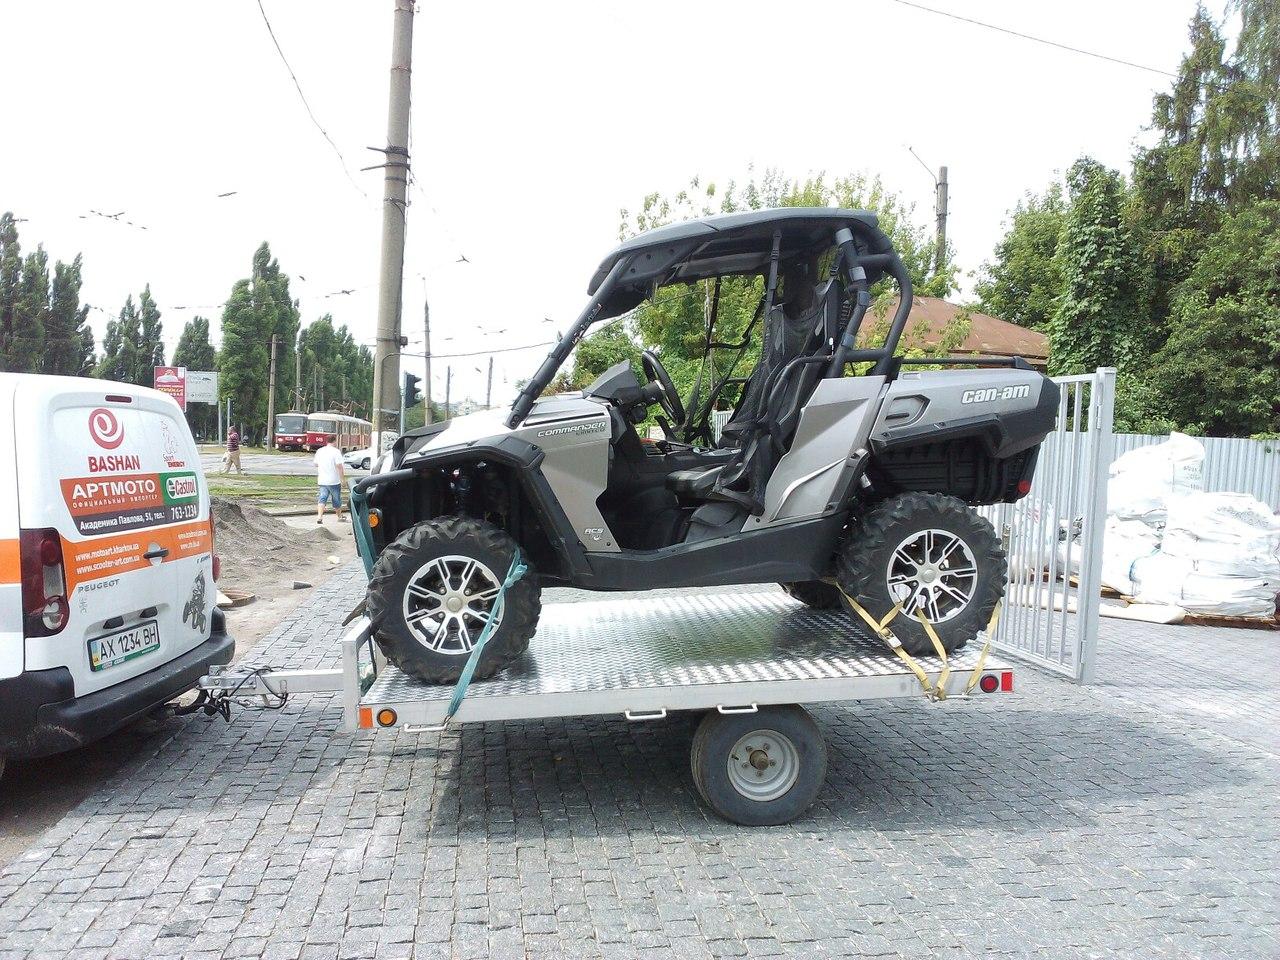 ПРИЦЕП ДЛЯ ПЕРЕВОЗКИ КВАДРОЦИКЛА FOREST RIVER  Артмото - купить квадроцикл в украине и харькове, мотоцикл, снегоход, скутер, мопед, электромобиль